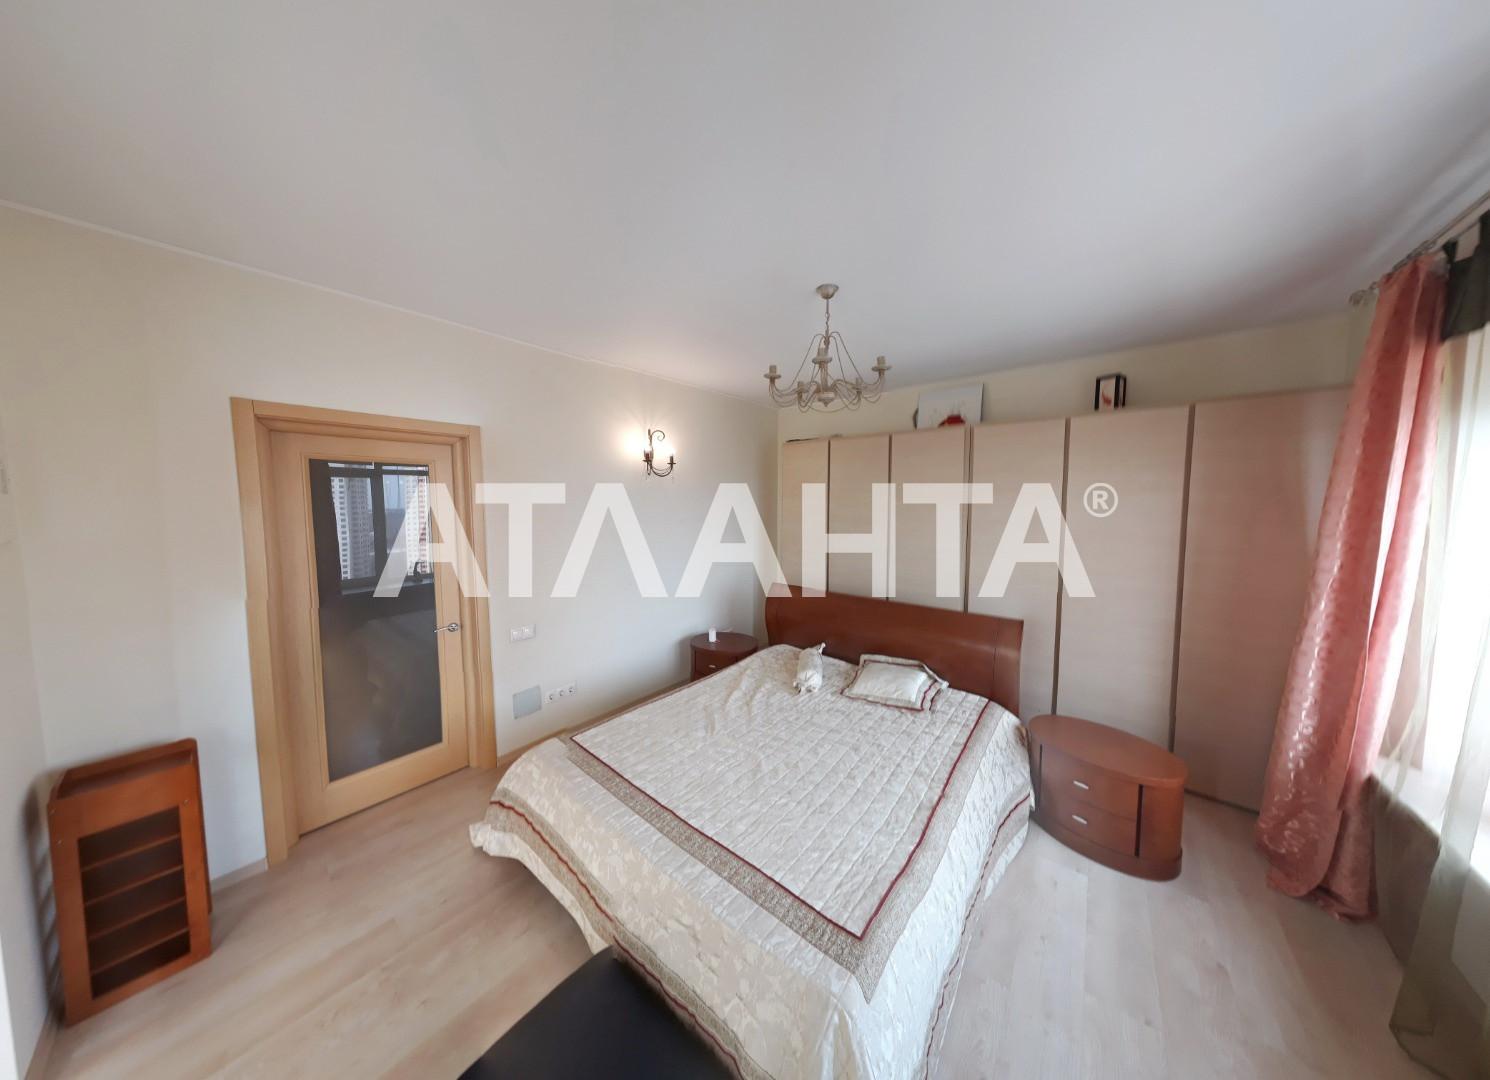 Продается 3-комнатная Квартира на ул. Ломоносова — 118 900 у.е. (фото №16)